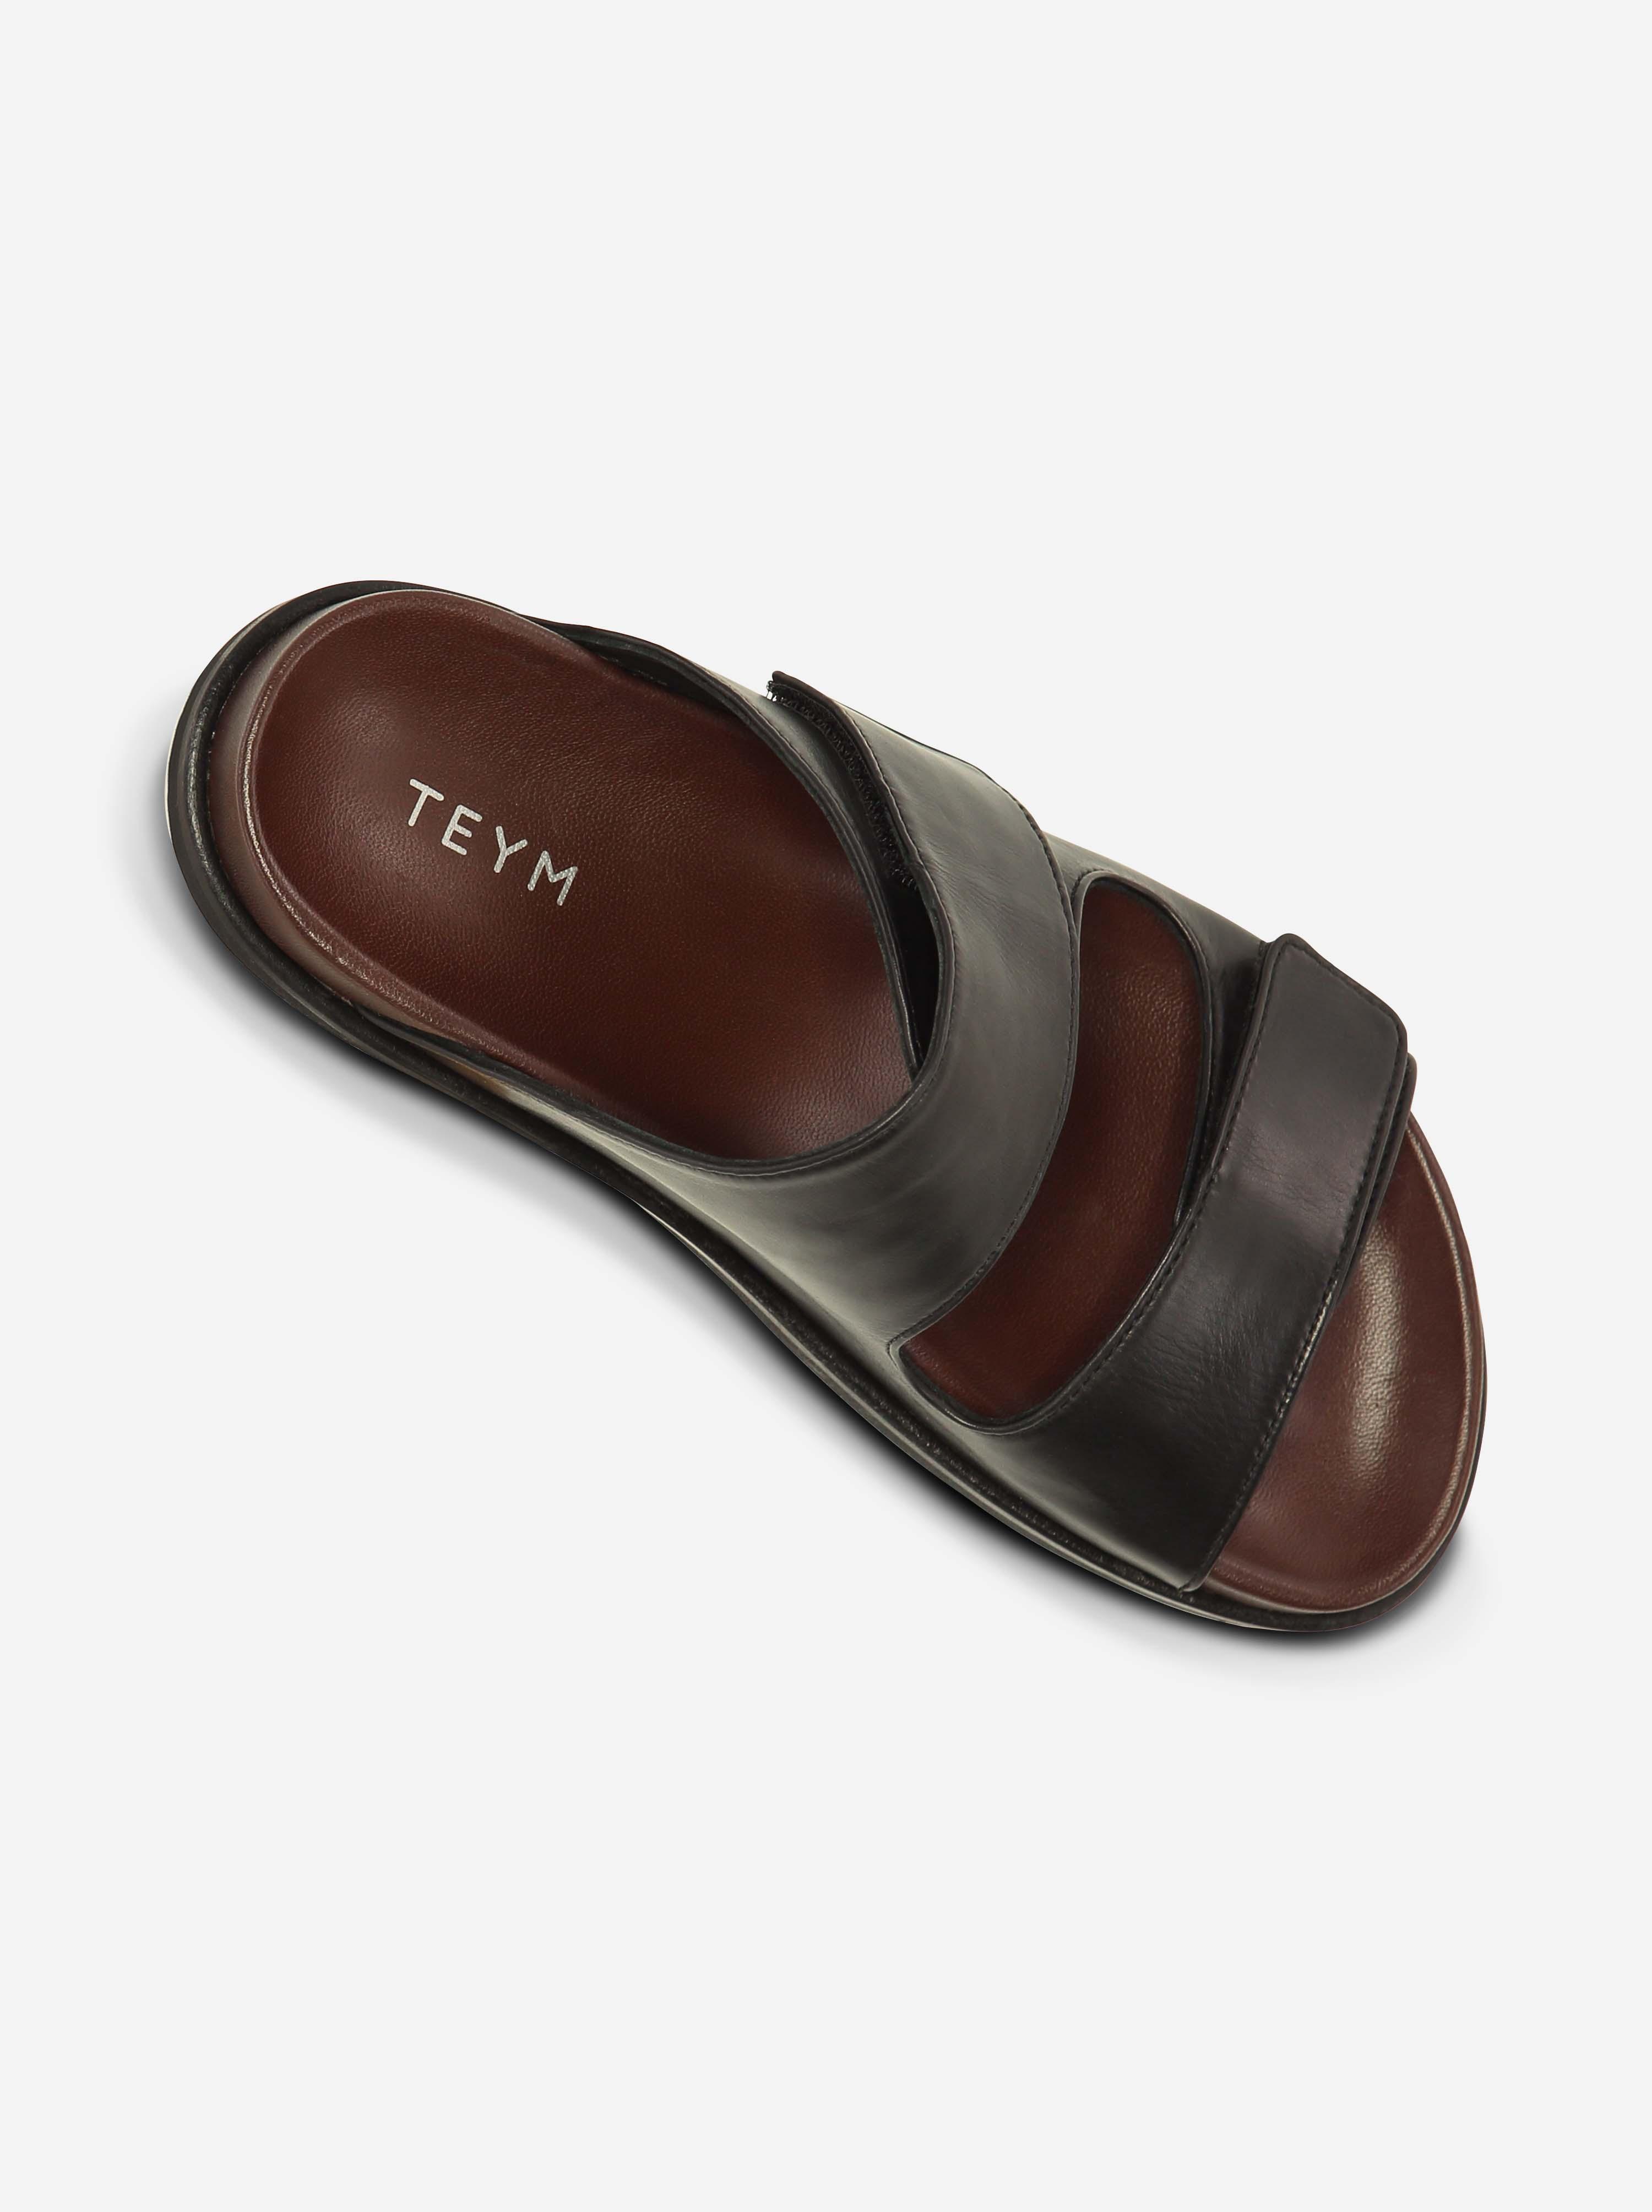 Teym - The Sandal - Black - 9